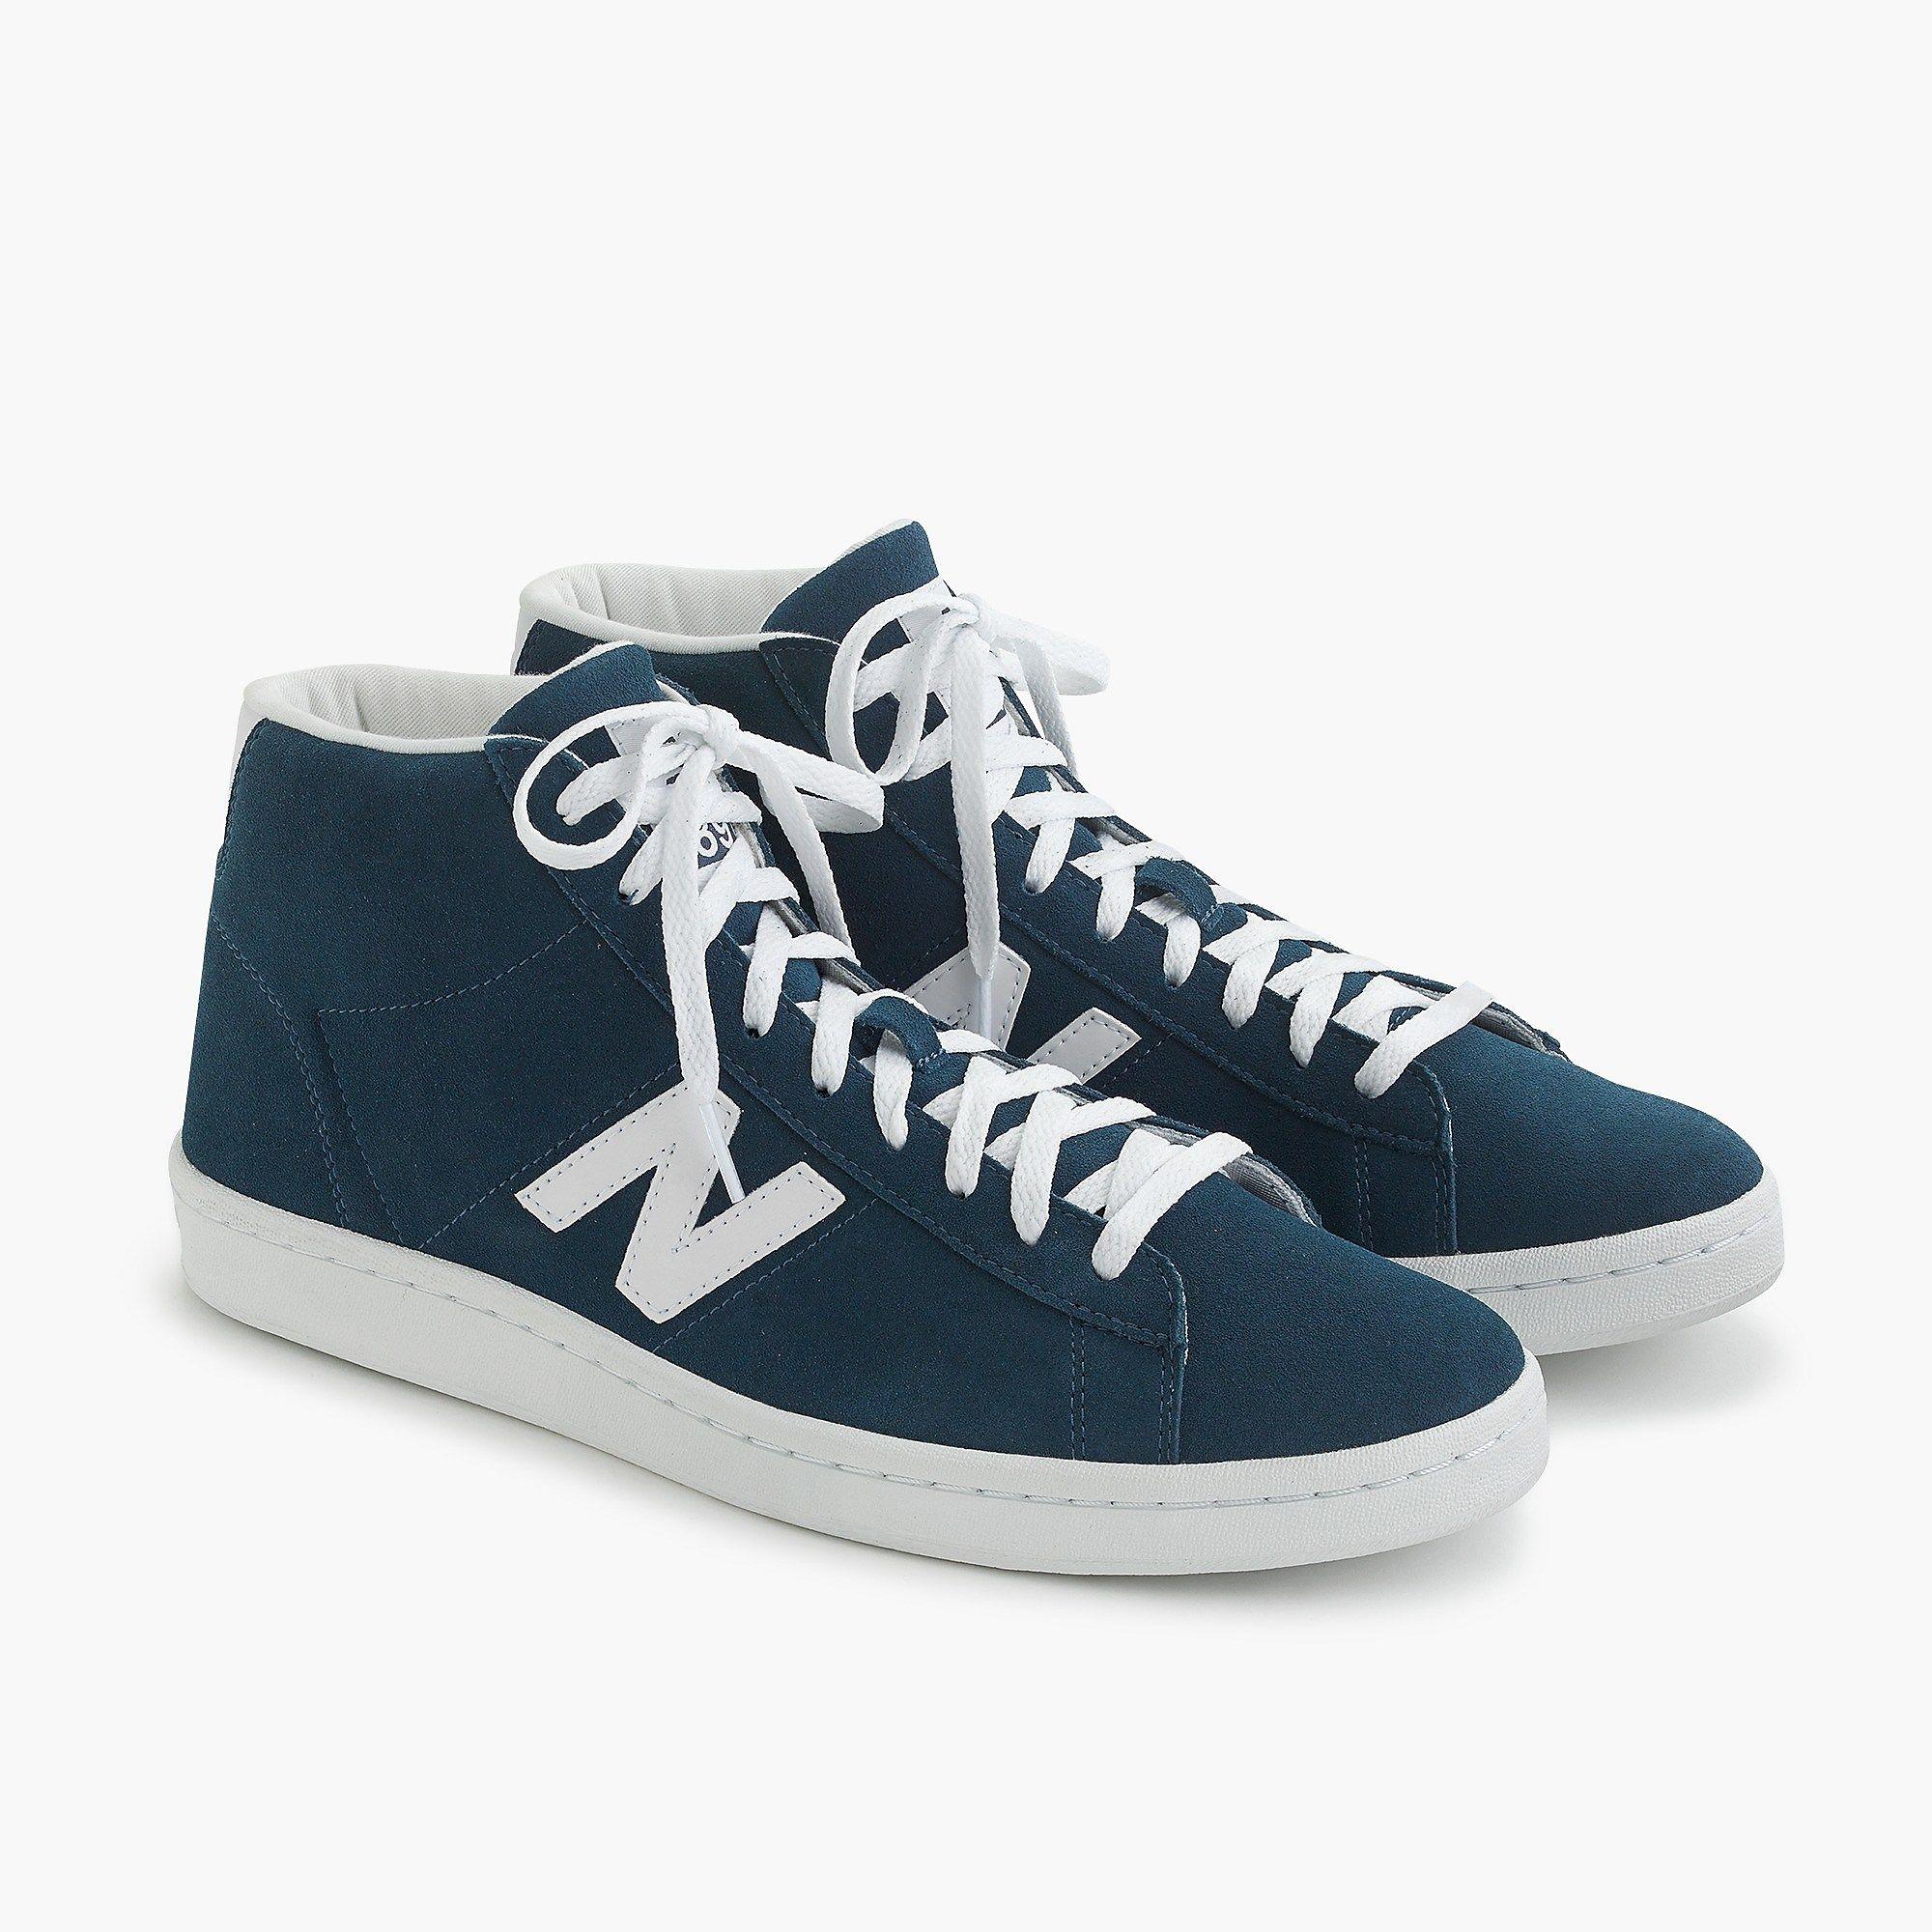 J.Crew 891 High-Top Sneakers